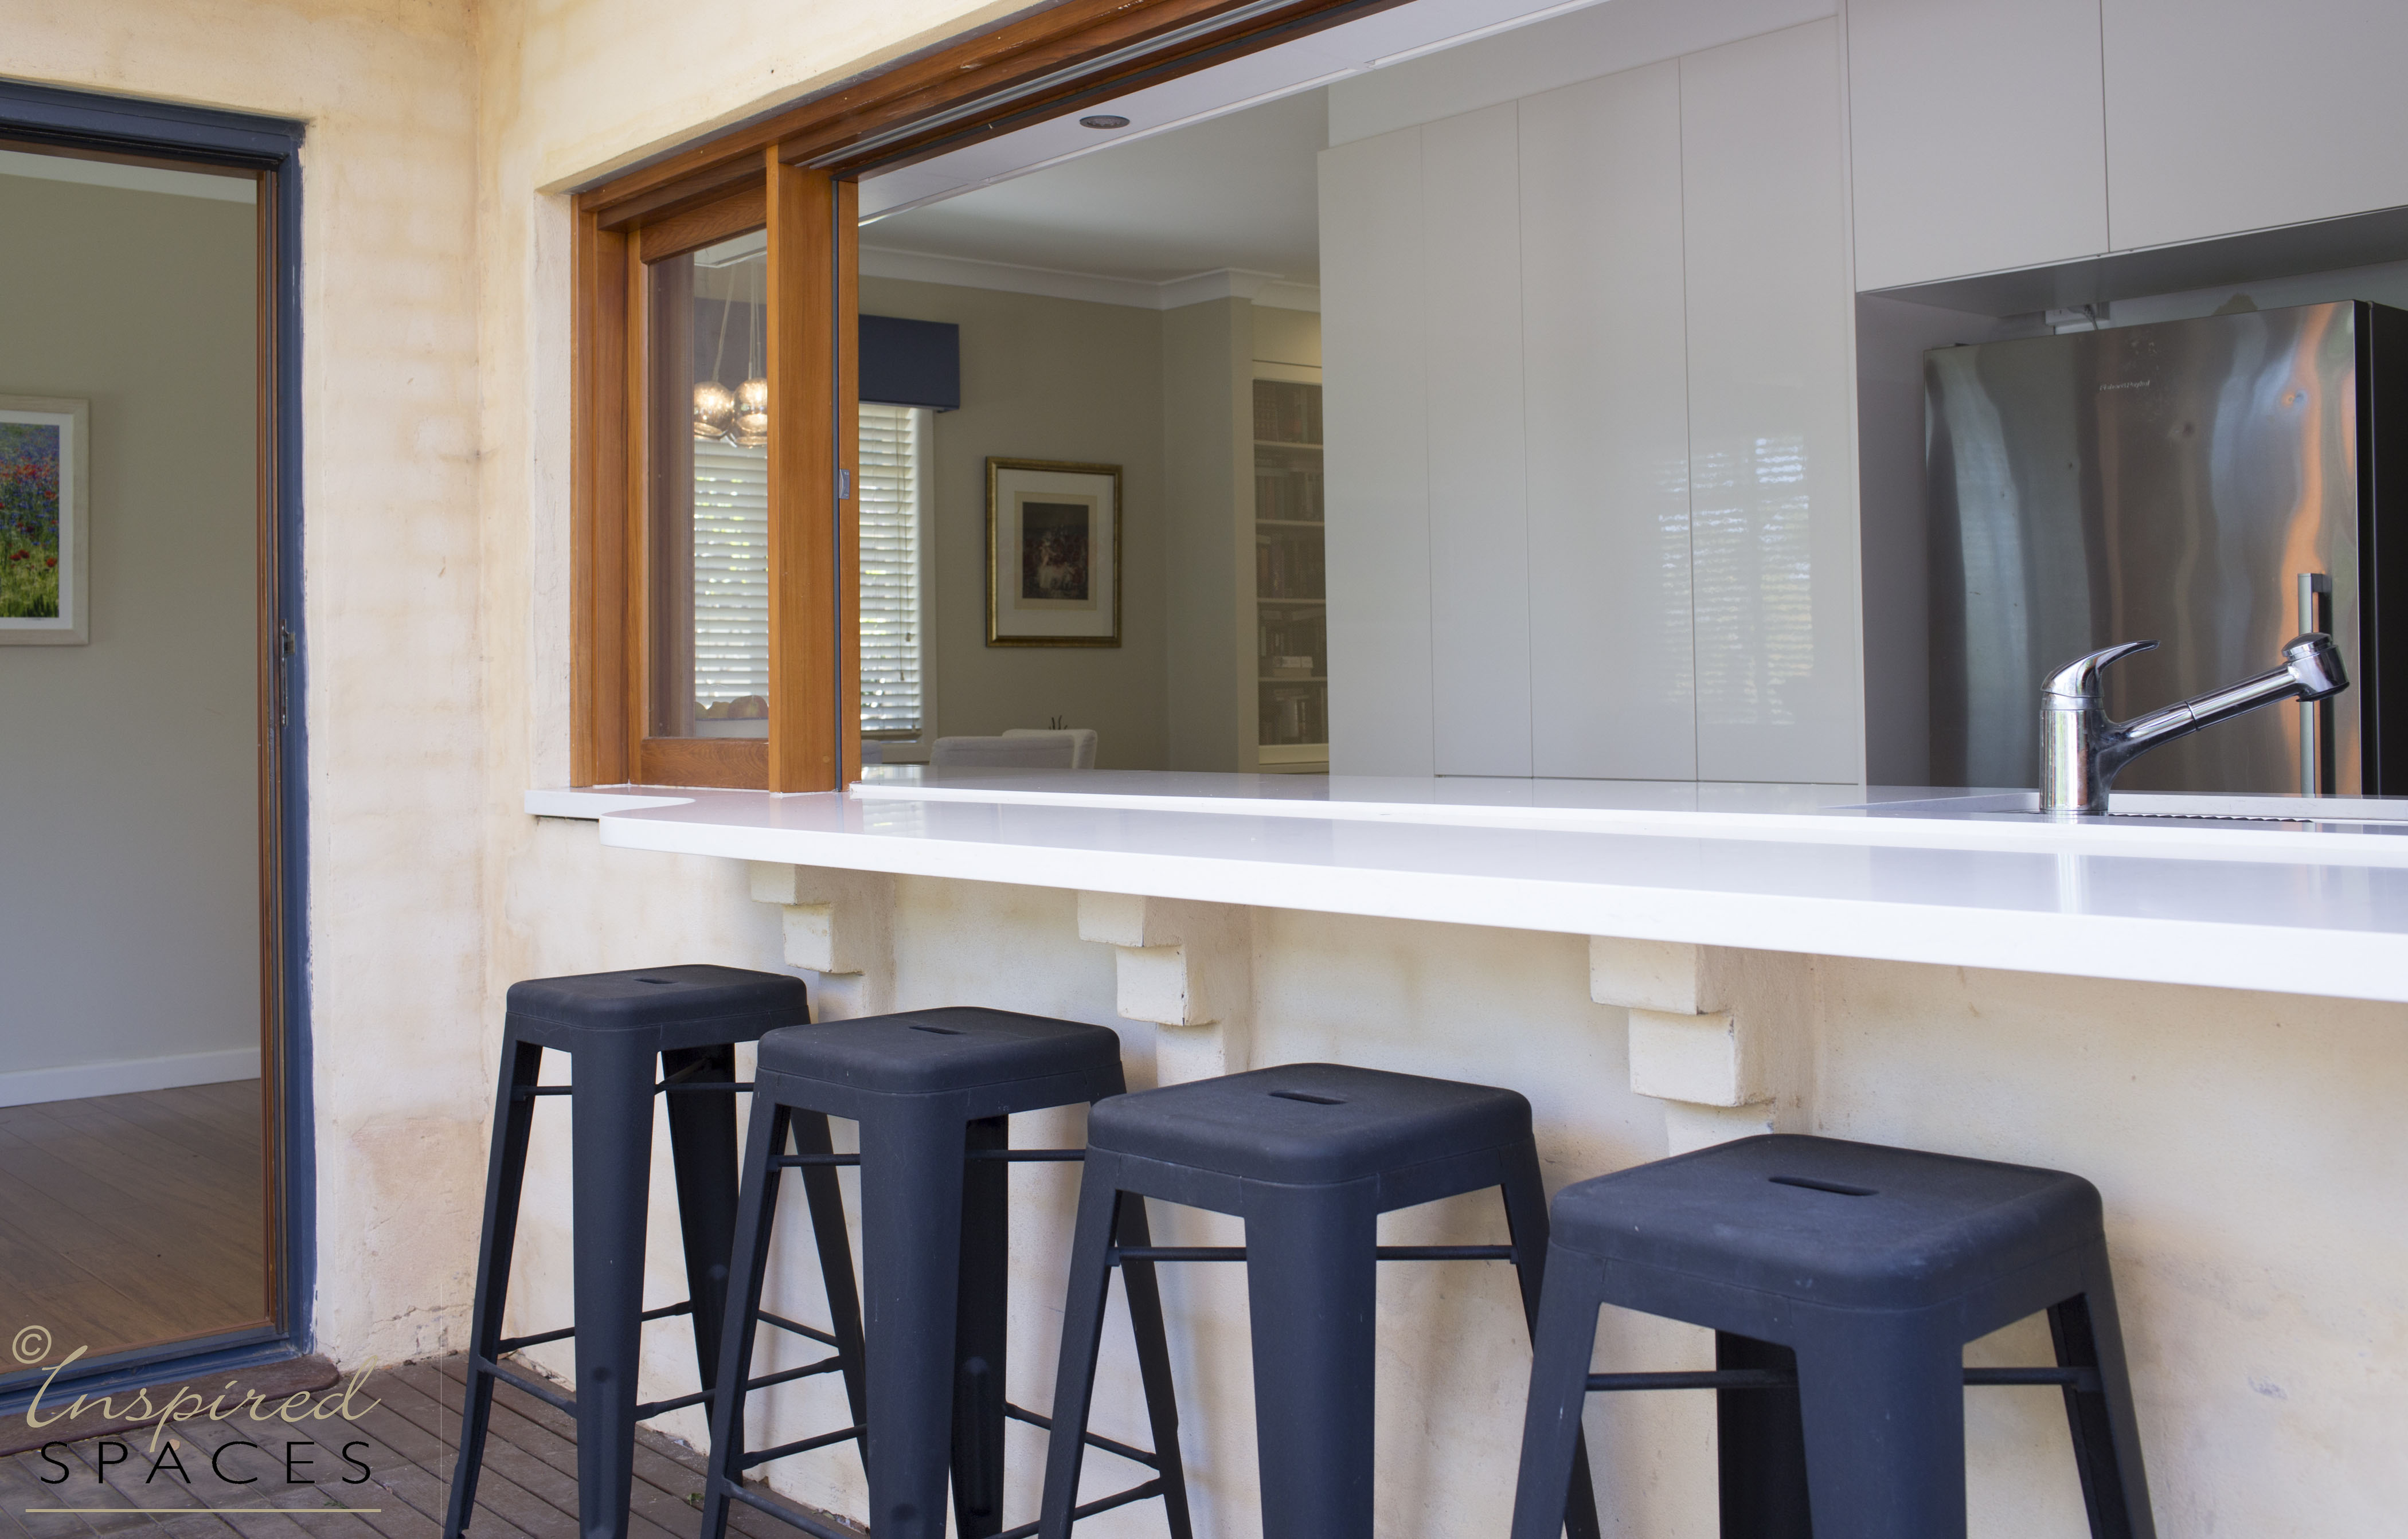 Bifold window in kitchen servery